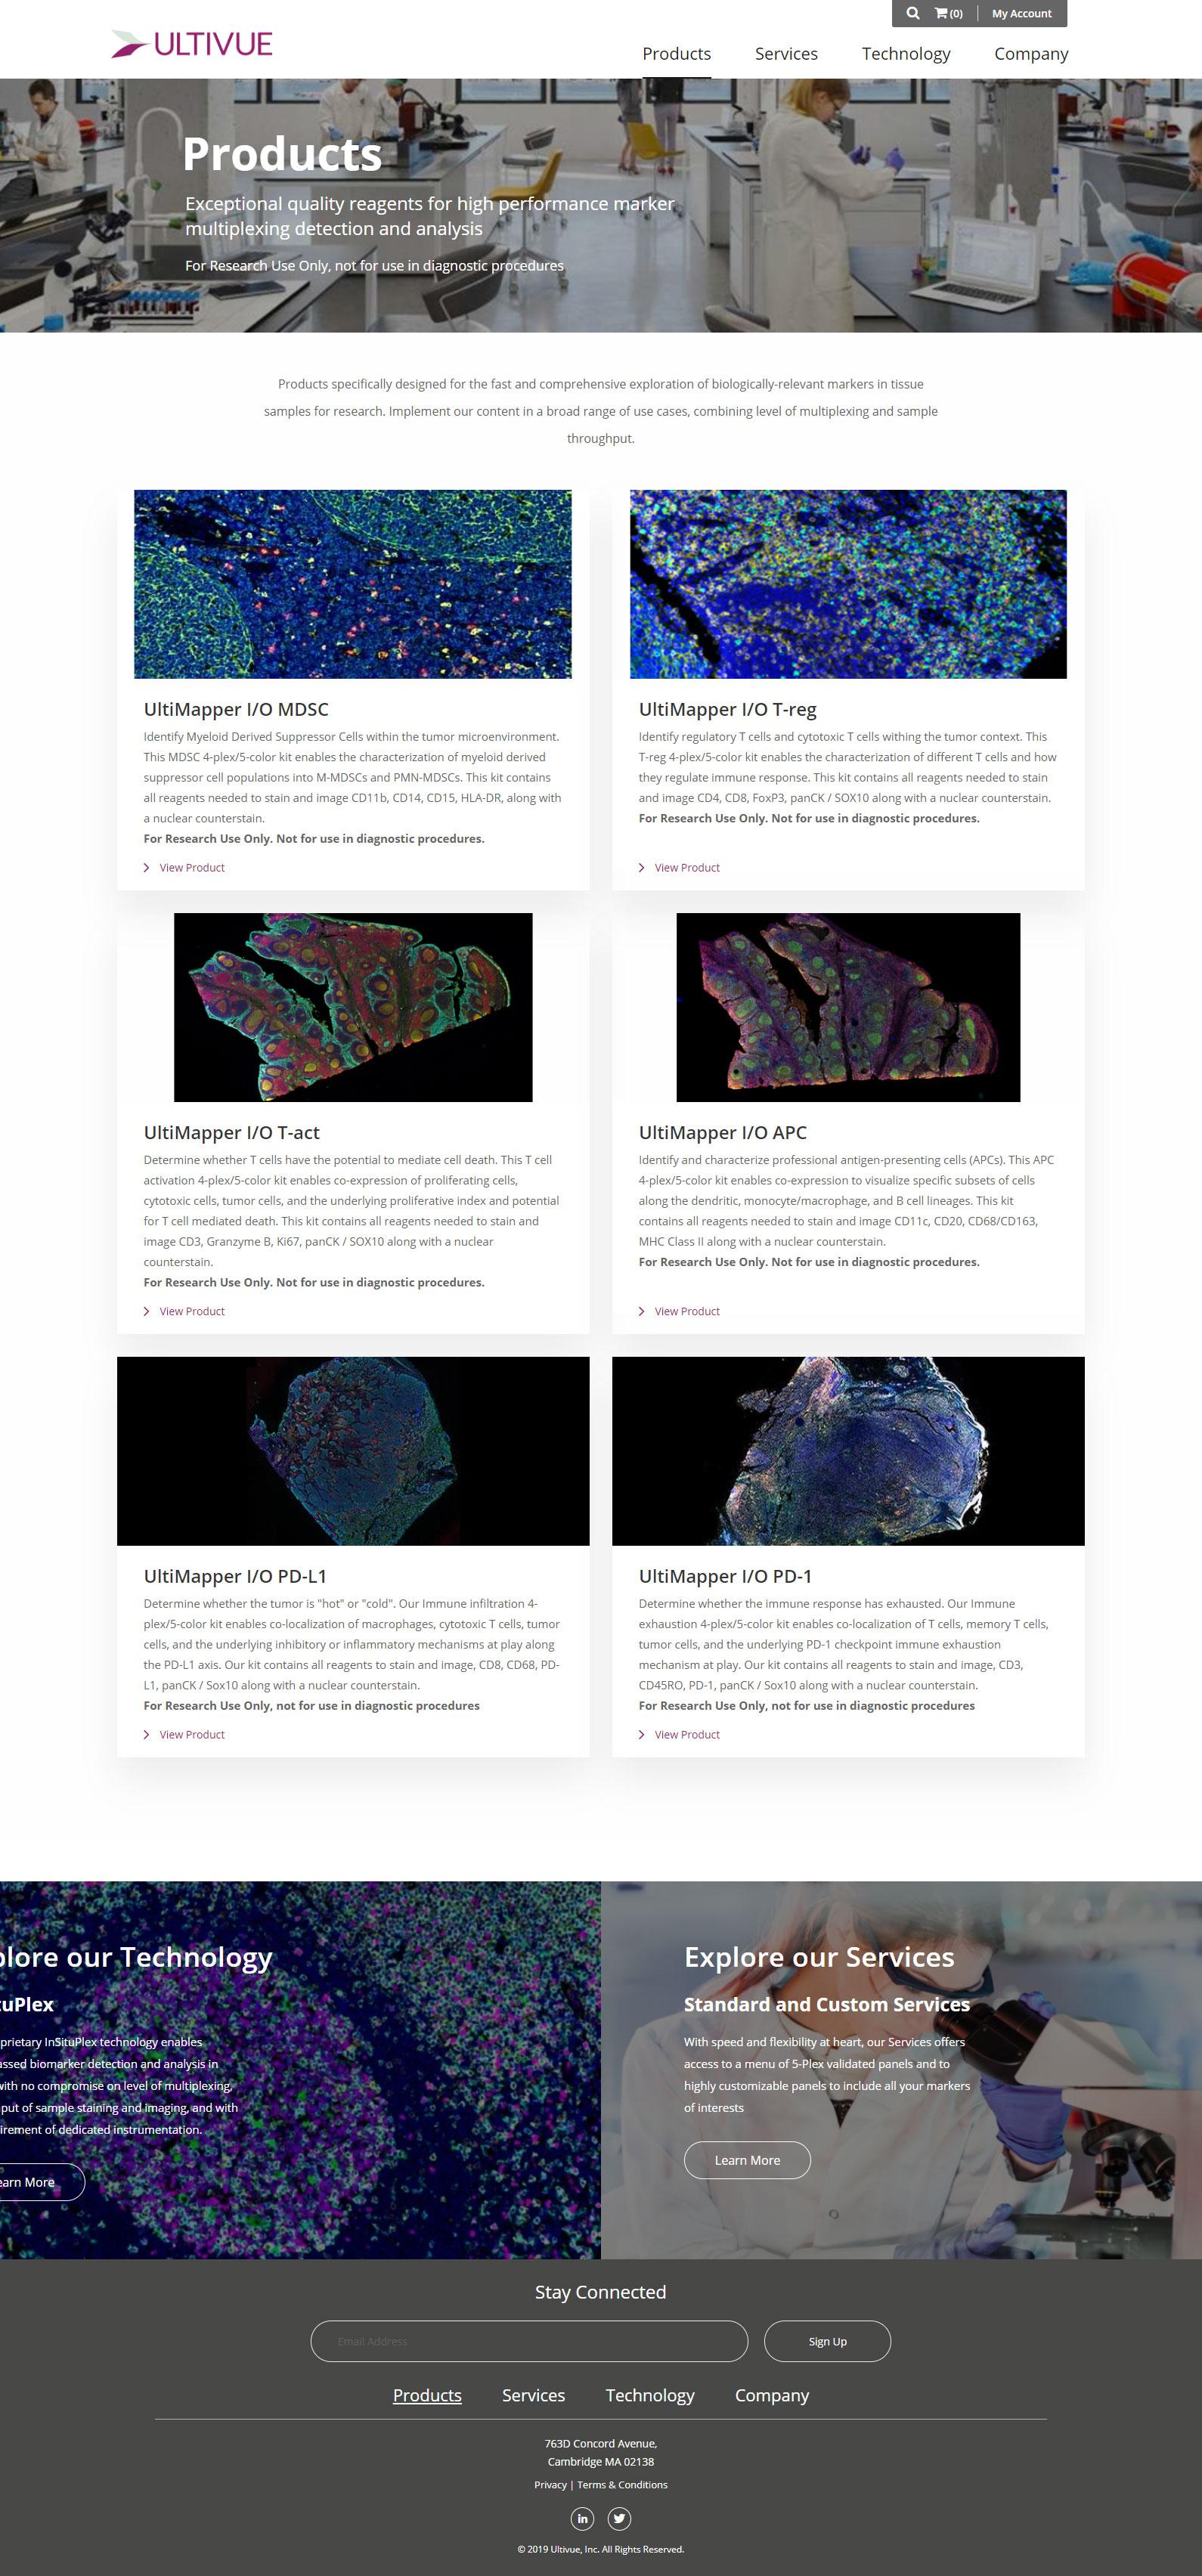 Ultivue Enterprise Website Development and Design Project